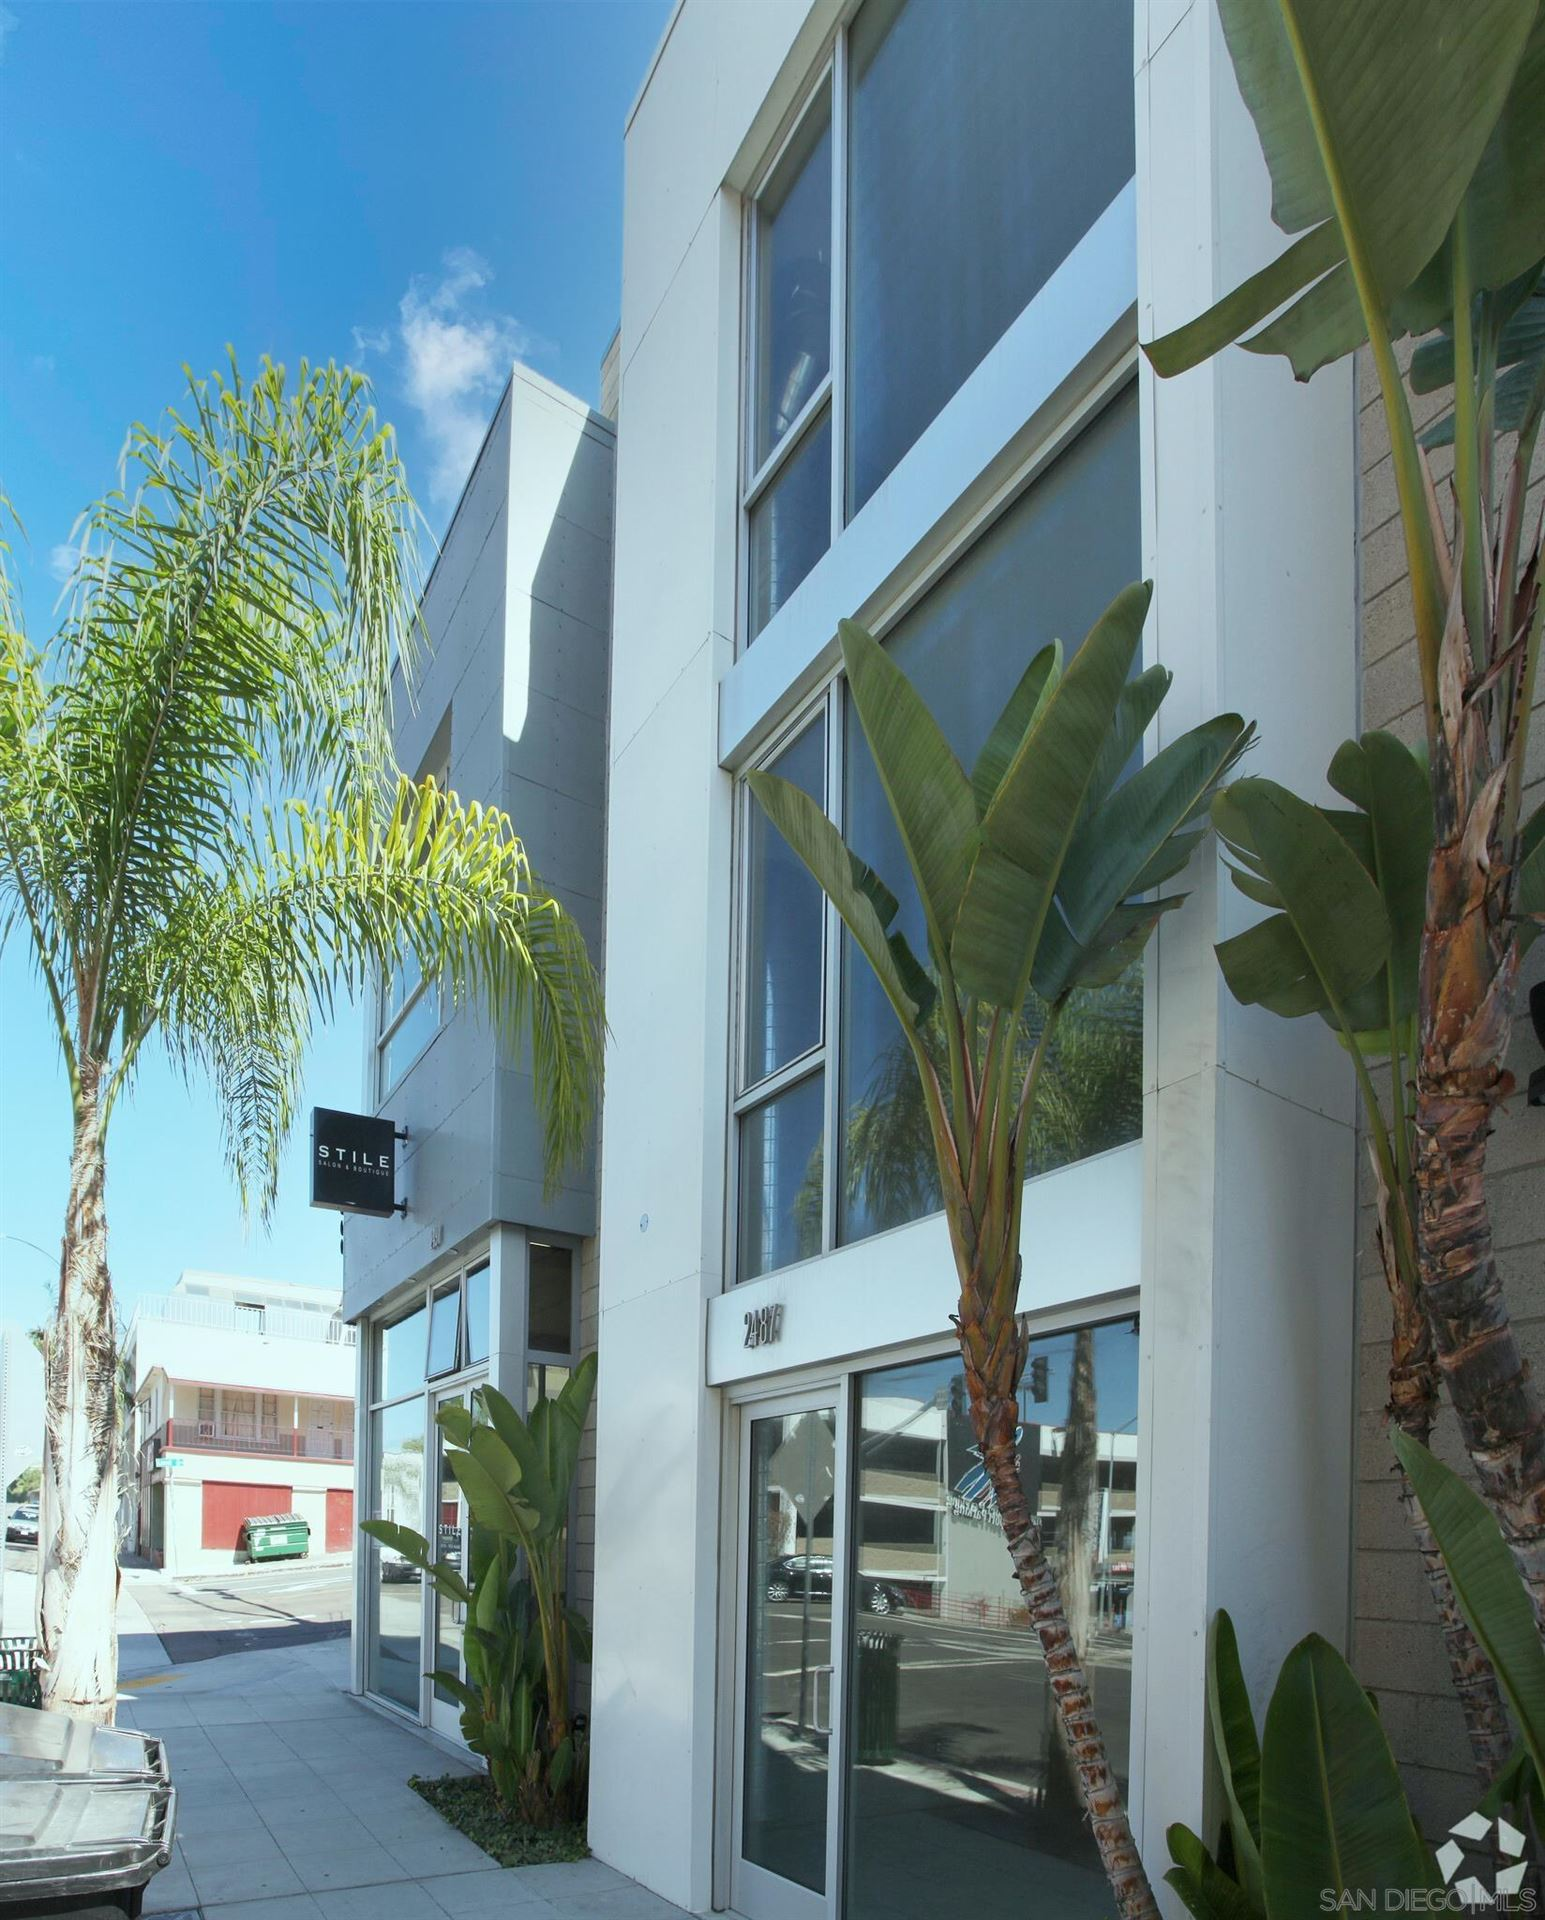 2491 Kettner                                                                               San Diego                                                                      , CA - $1,350,000